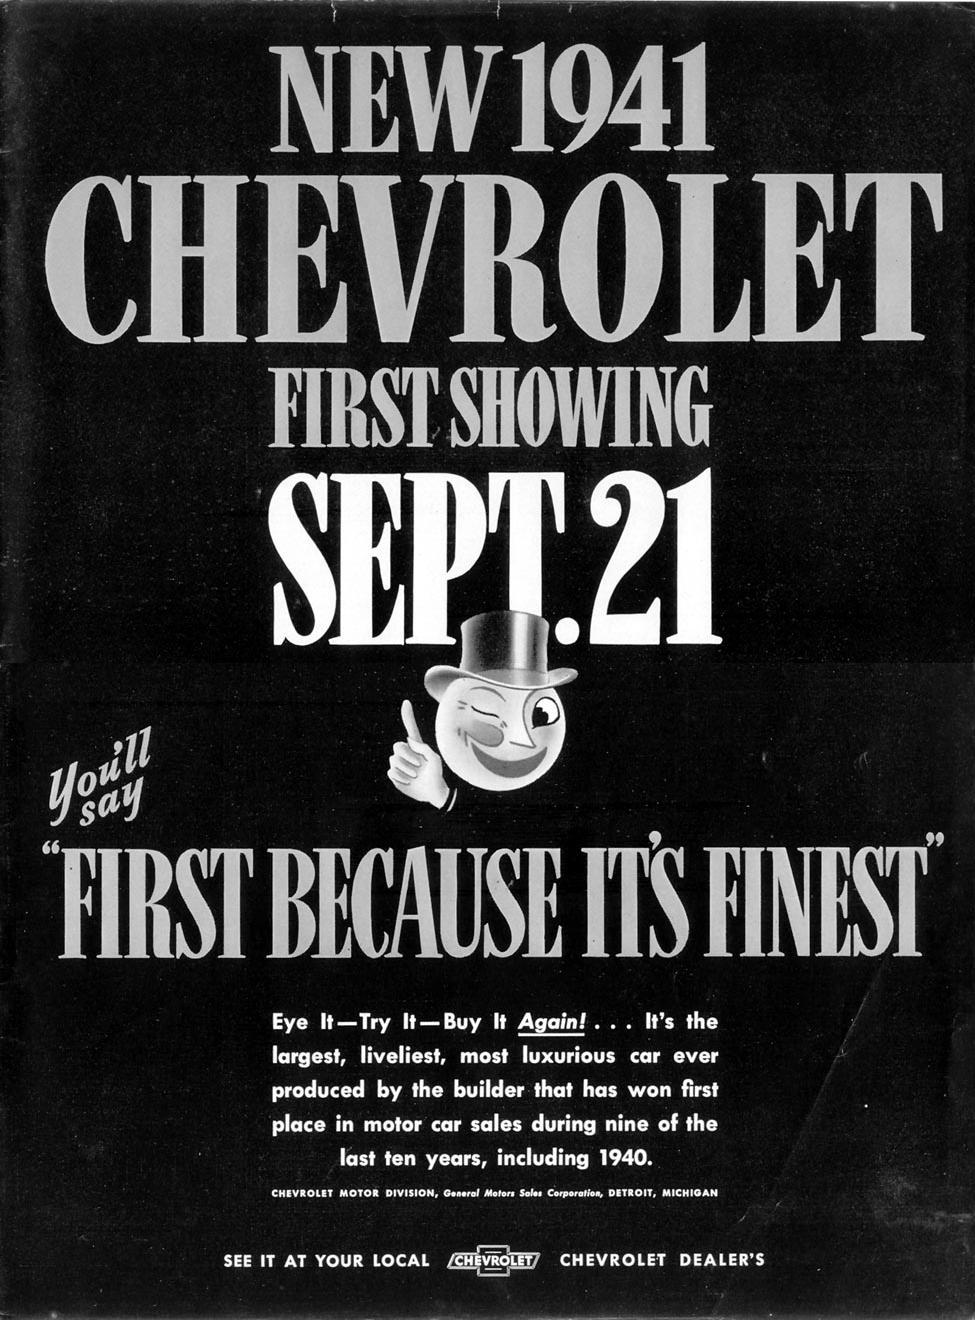 CHEVROLET AUTOMOBILES LIFE 09/16/1940 p. 1